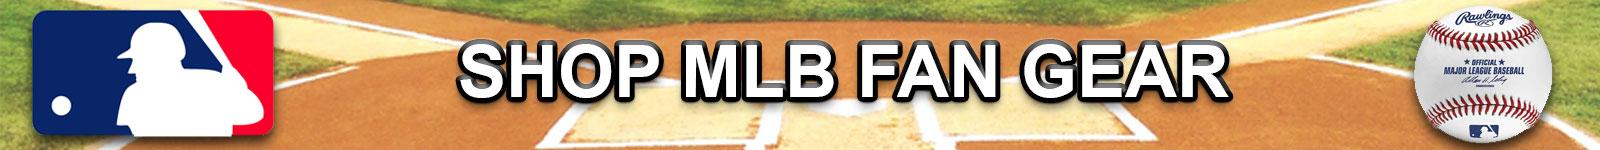 mlb-league-banner.jpg